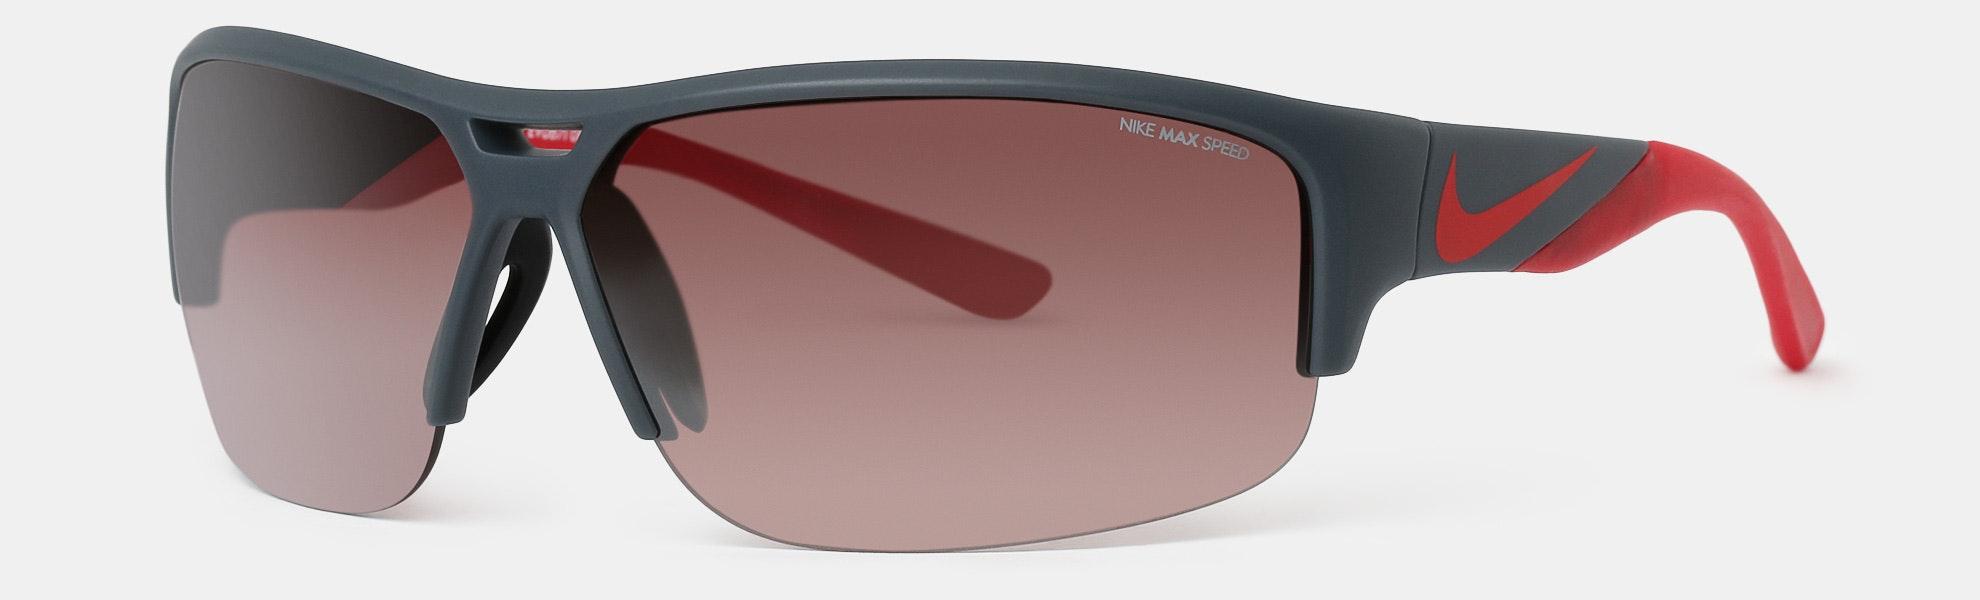 Nike Golf X2 E Sport Sunglasses w/ Max Tint Lens